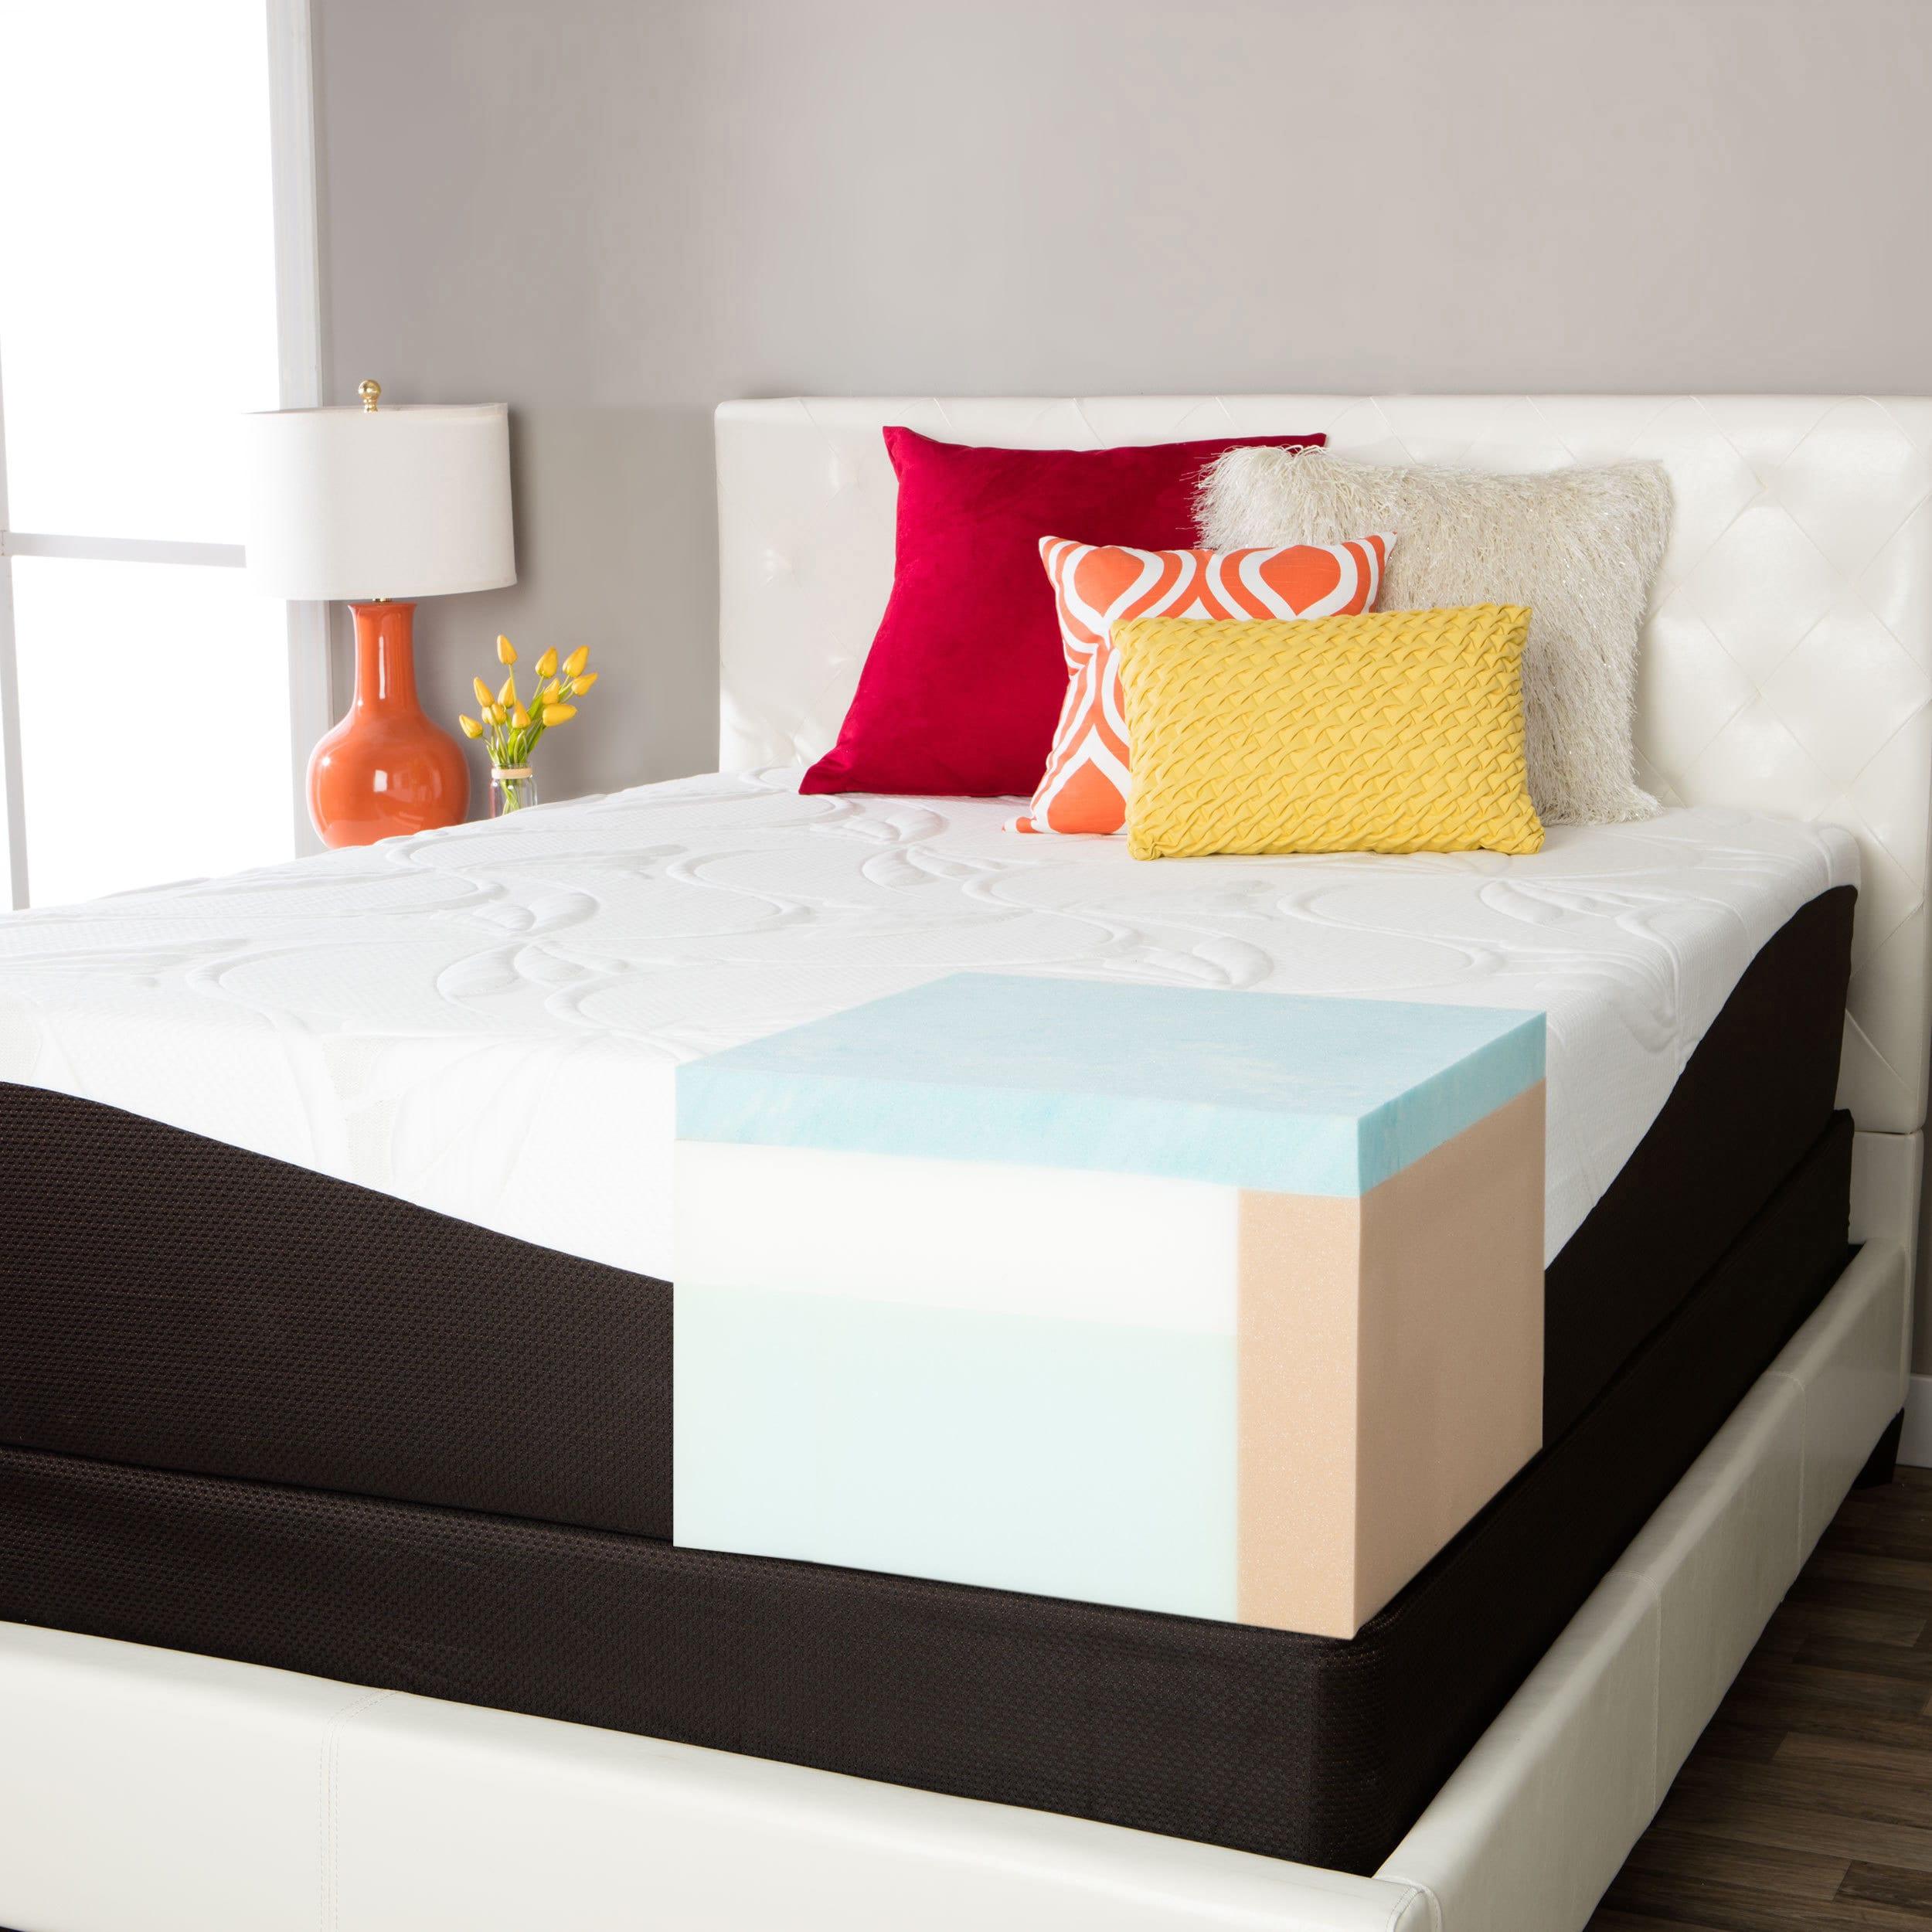 simmons beautyrest comforpedic from beautyrest choose your comfort gel memory foam 14 inch king size mattress set